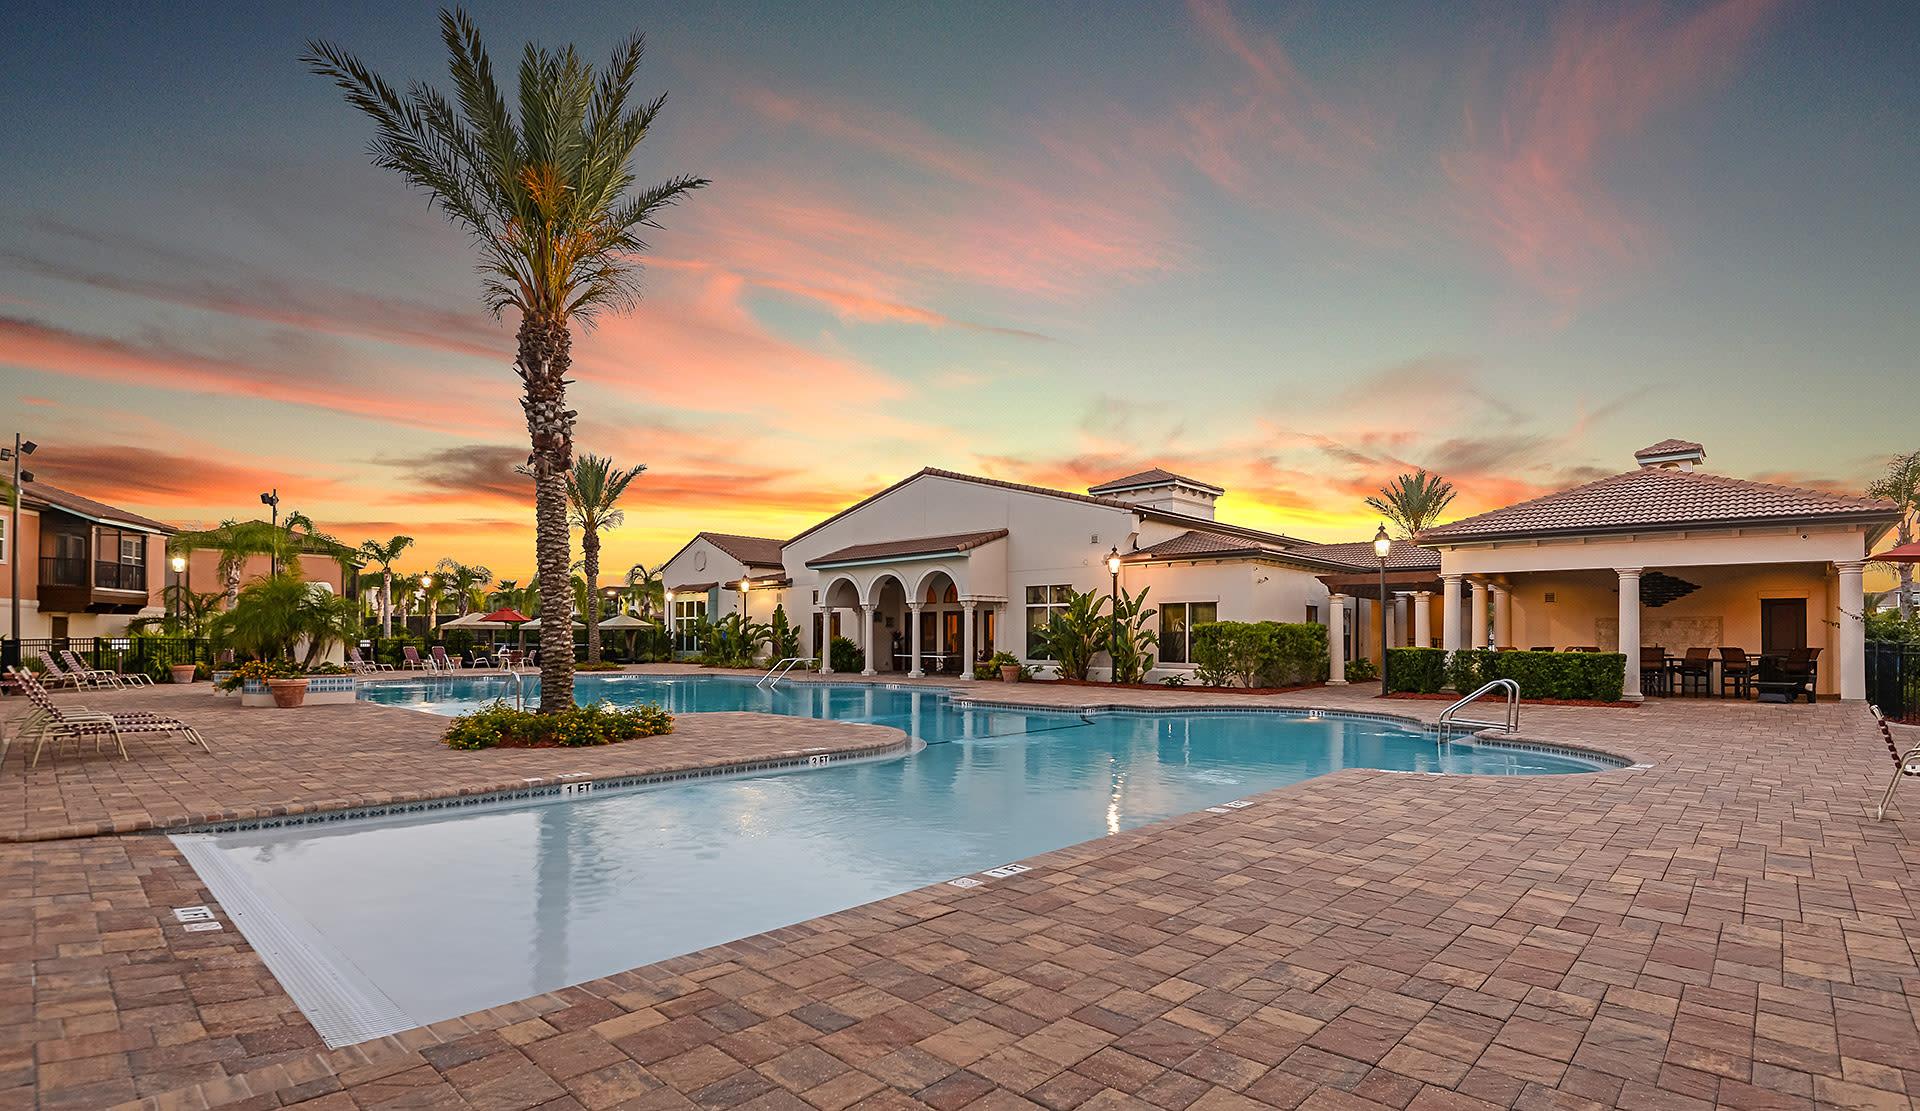 Swimming pool area at twilight at Hacienda Club in Jacksonville, Florida